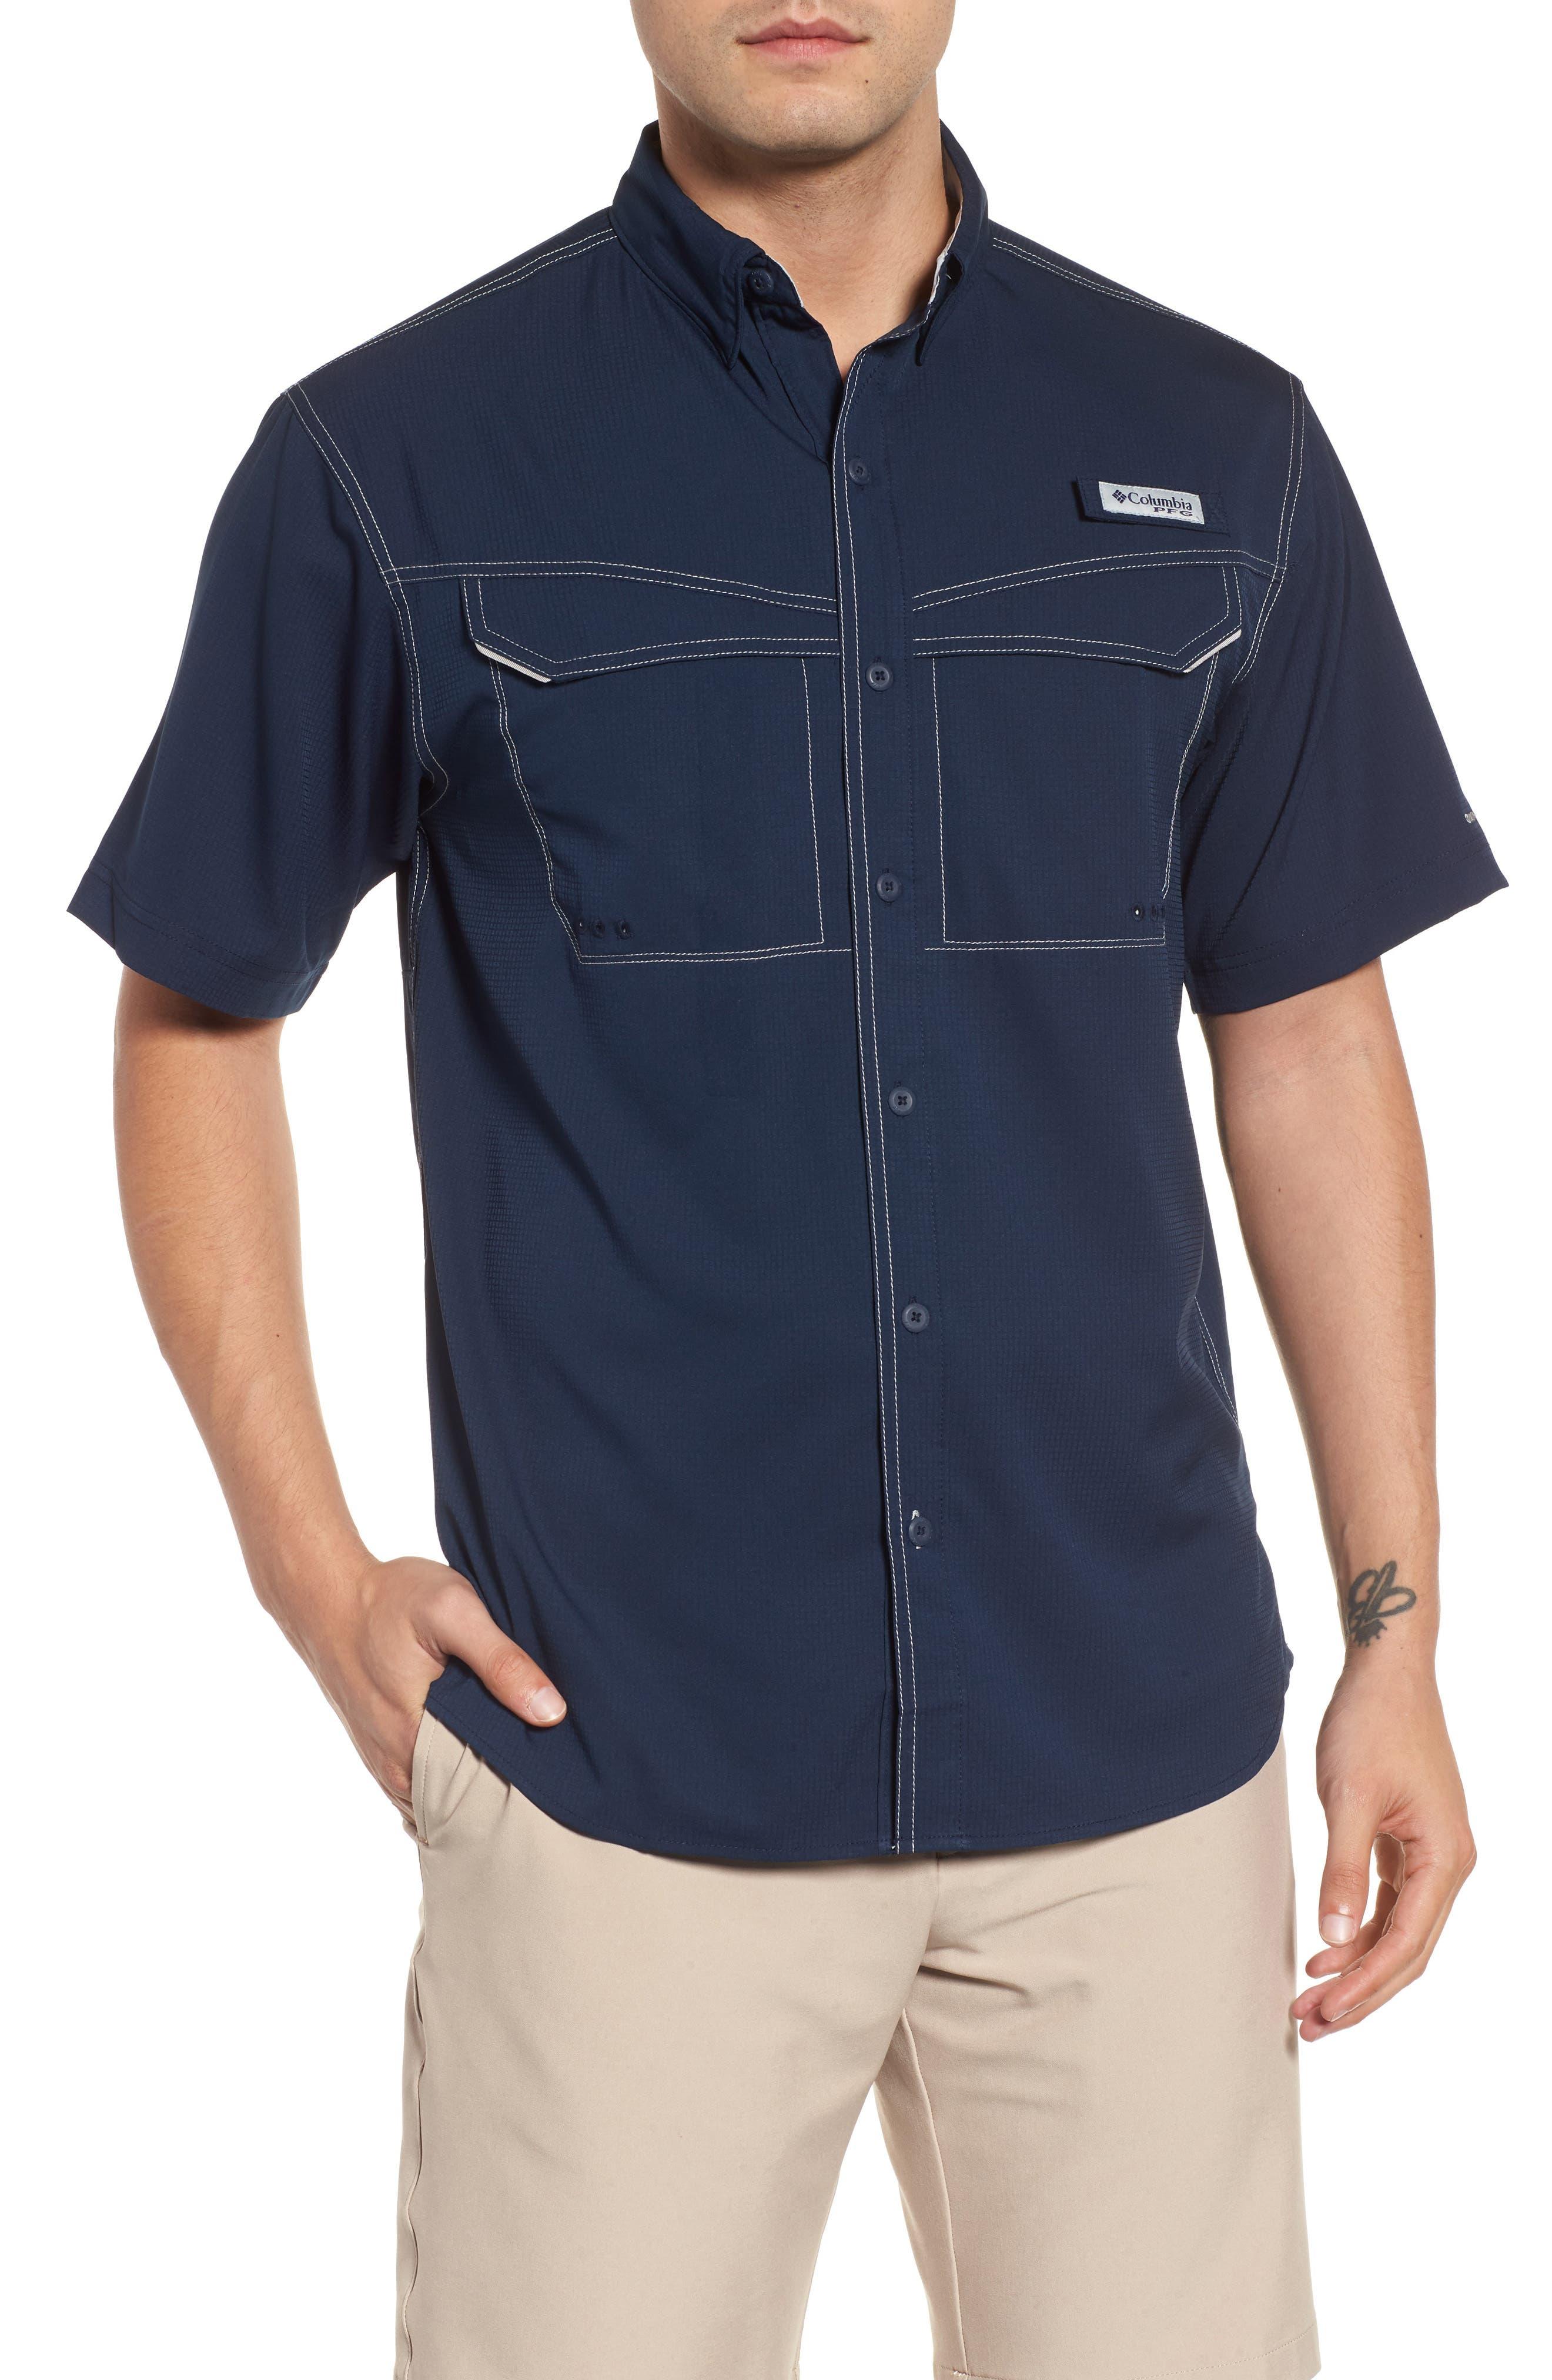 PFG Low Drag Offshore Woven Shirt,                             Main thumbnail 2, color,